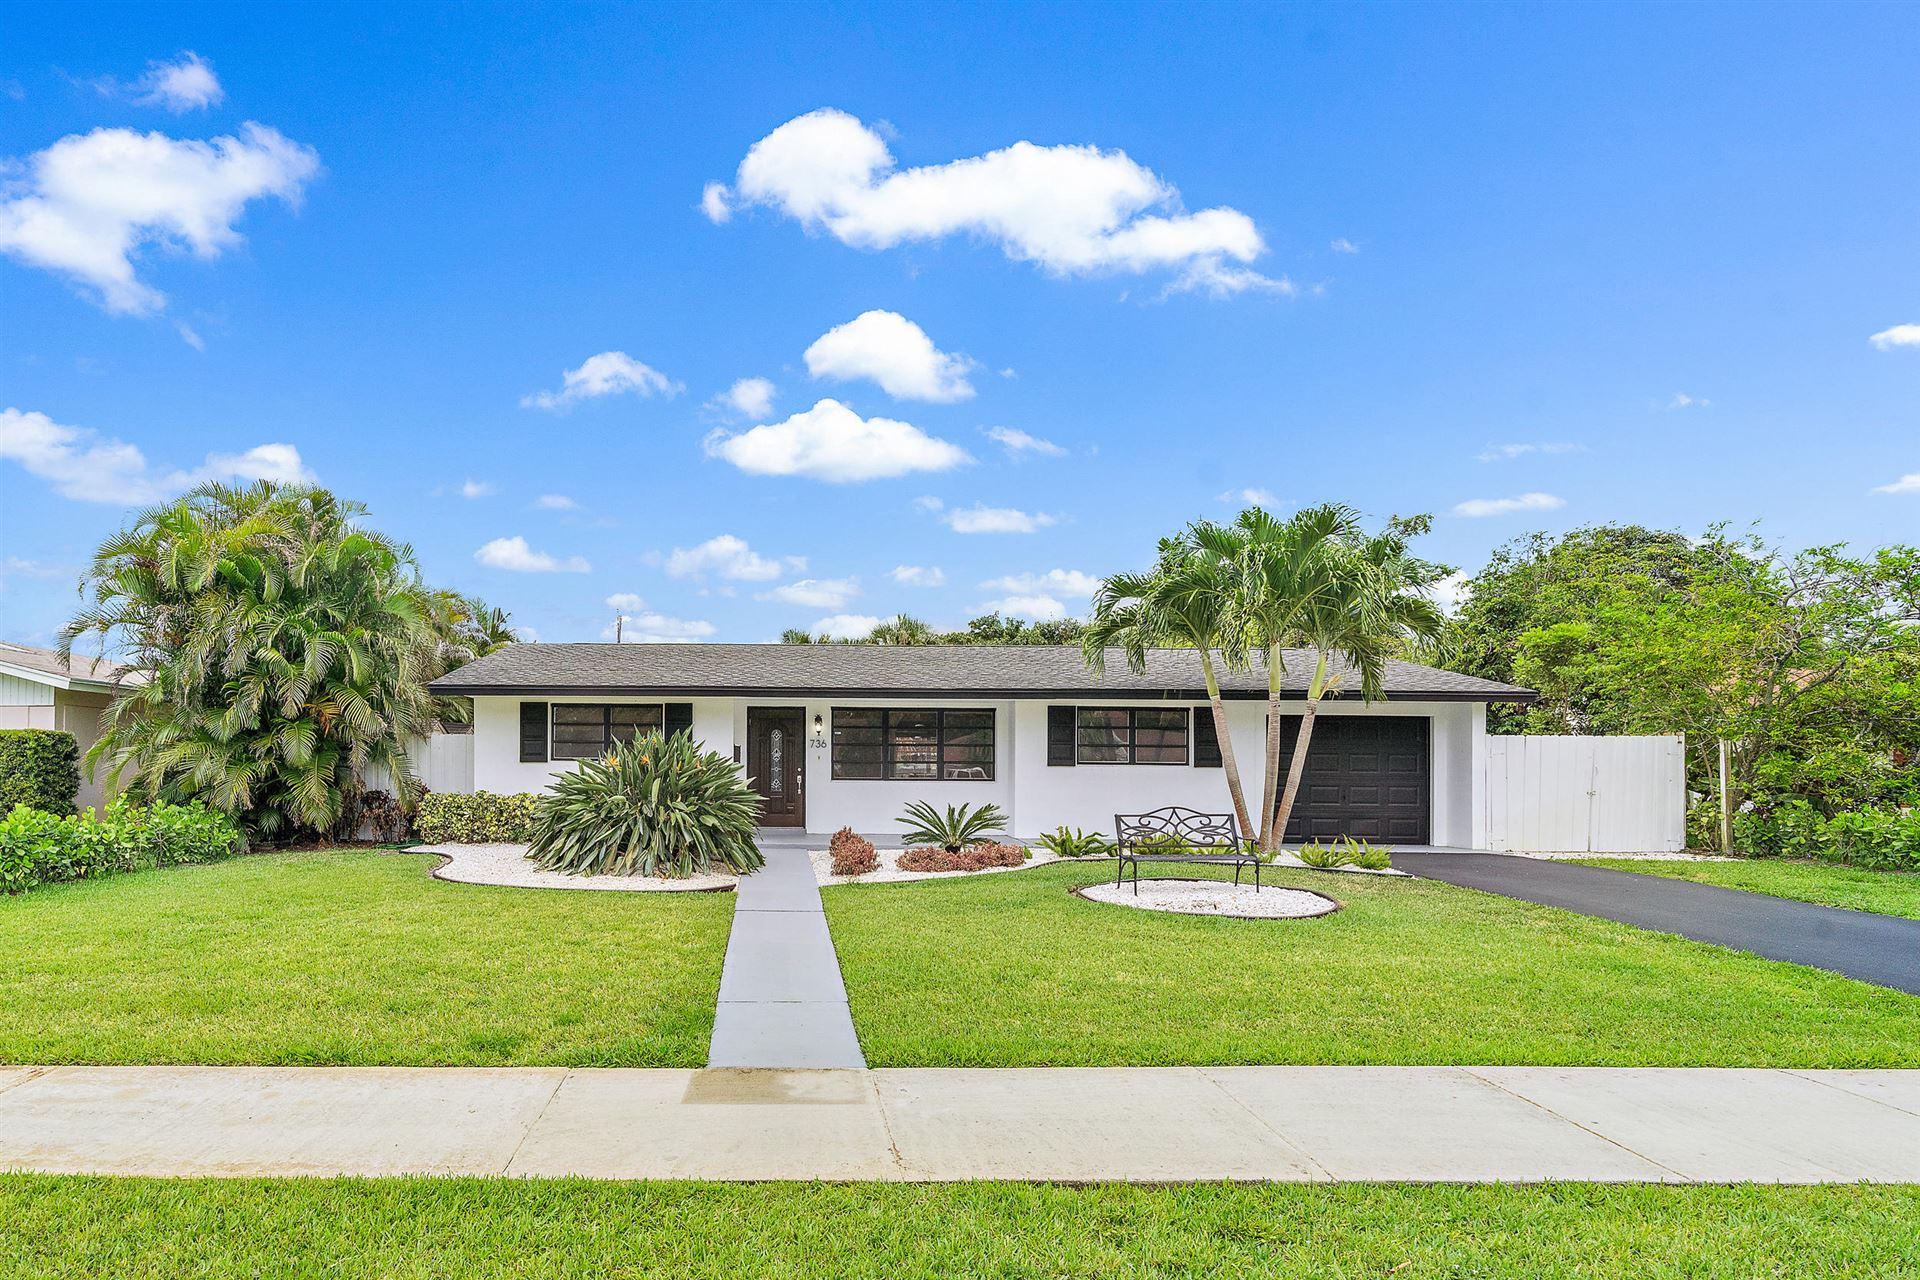 736 Magnolia Drive, Lake Park, FL 33403 - #: RX-10728093